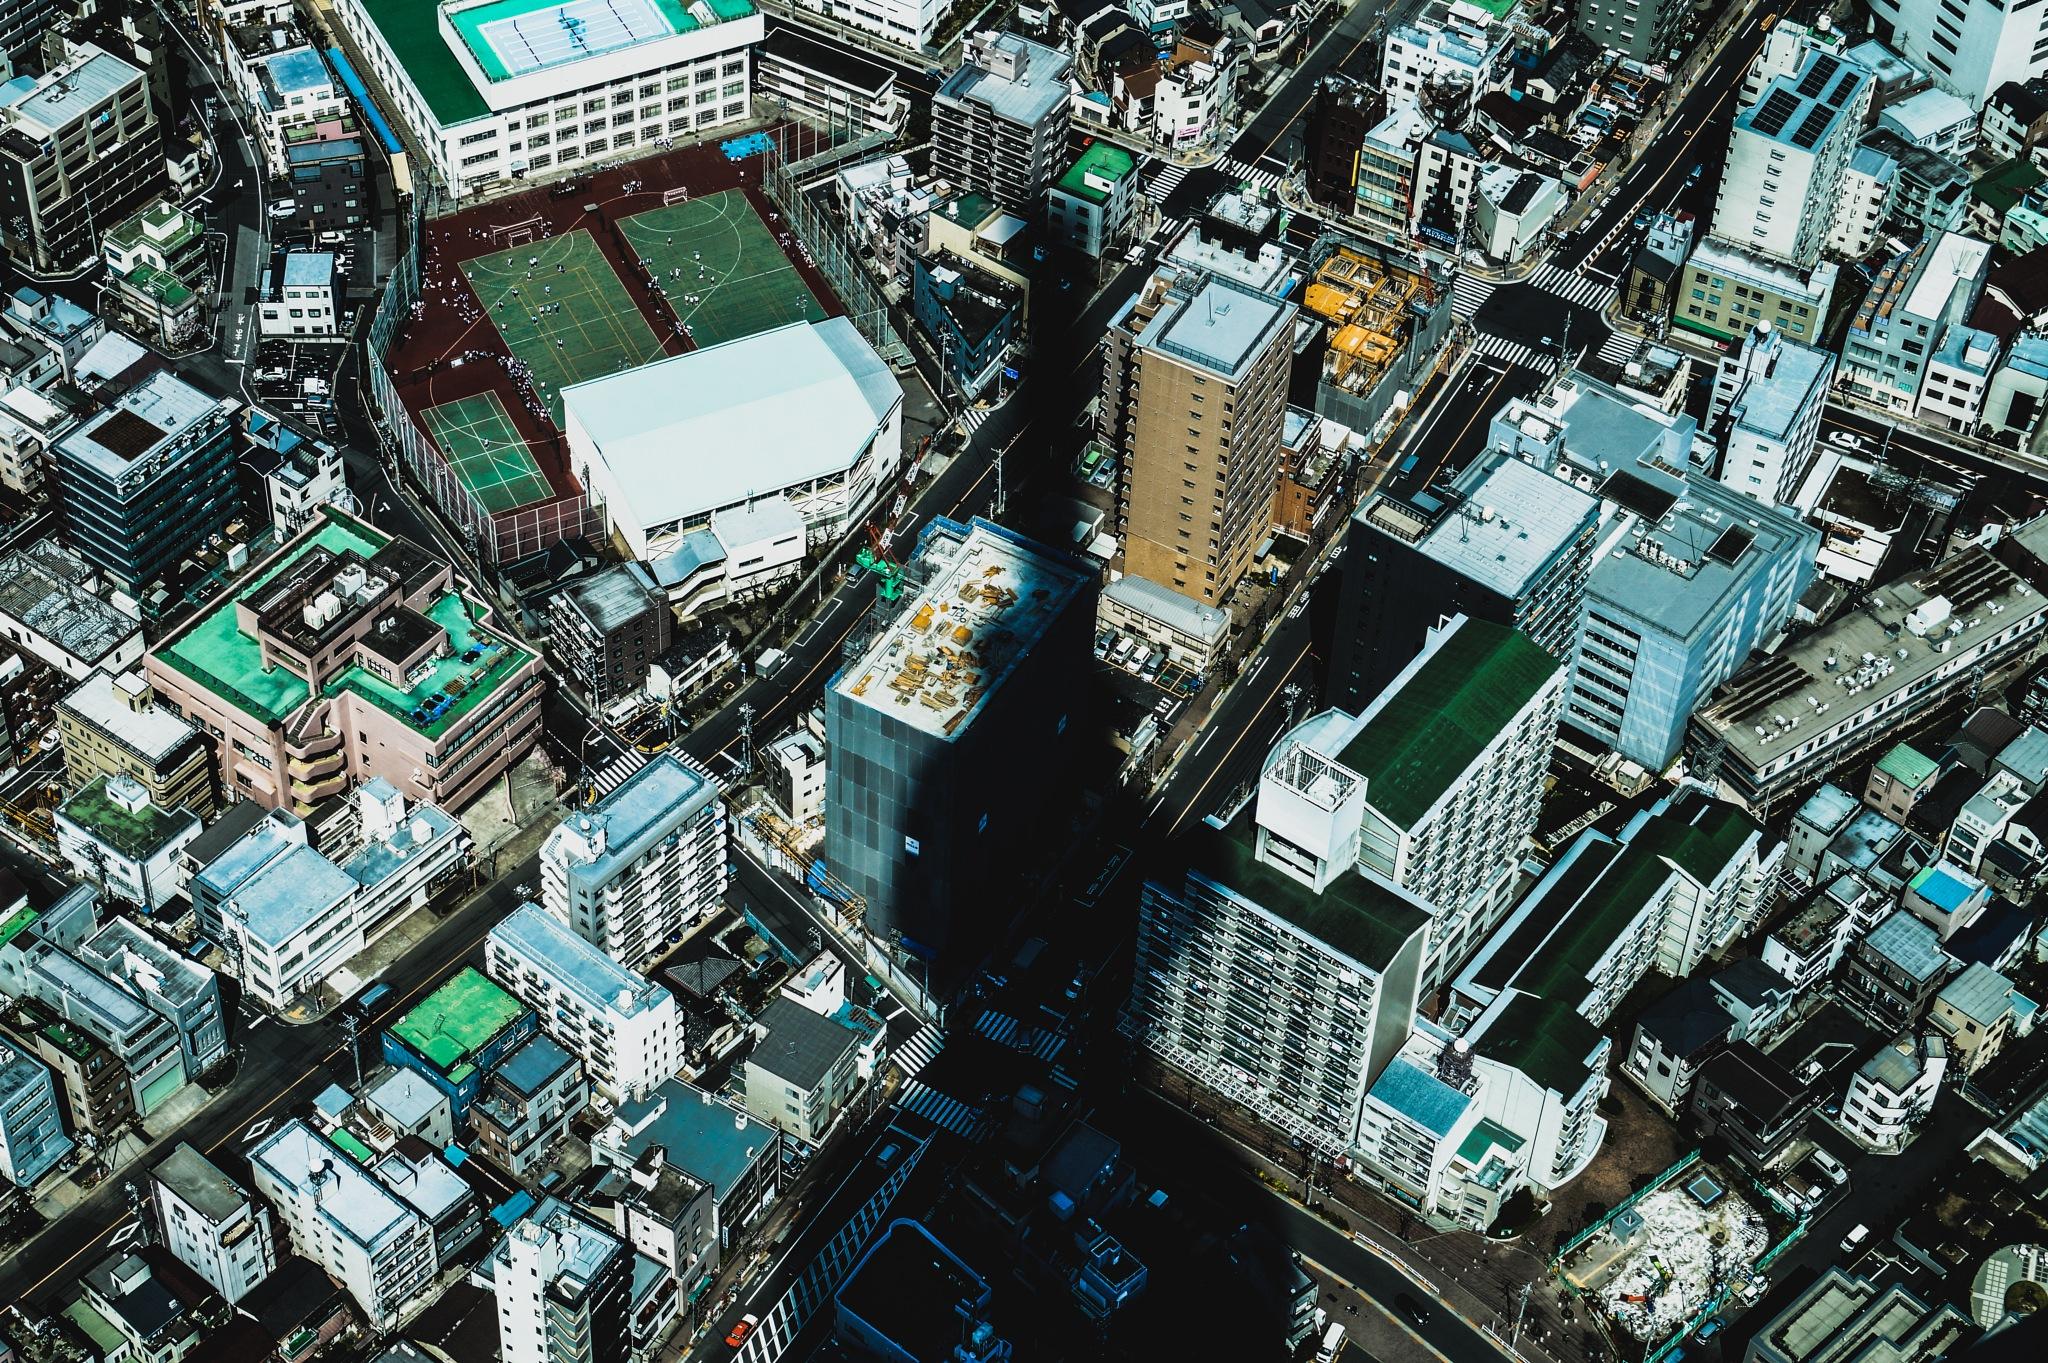 Above Japan by Sergio Vargas